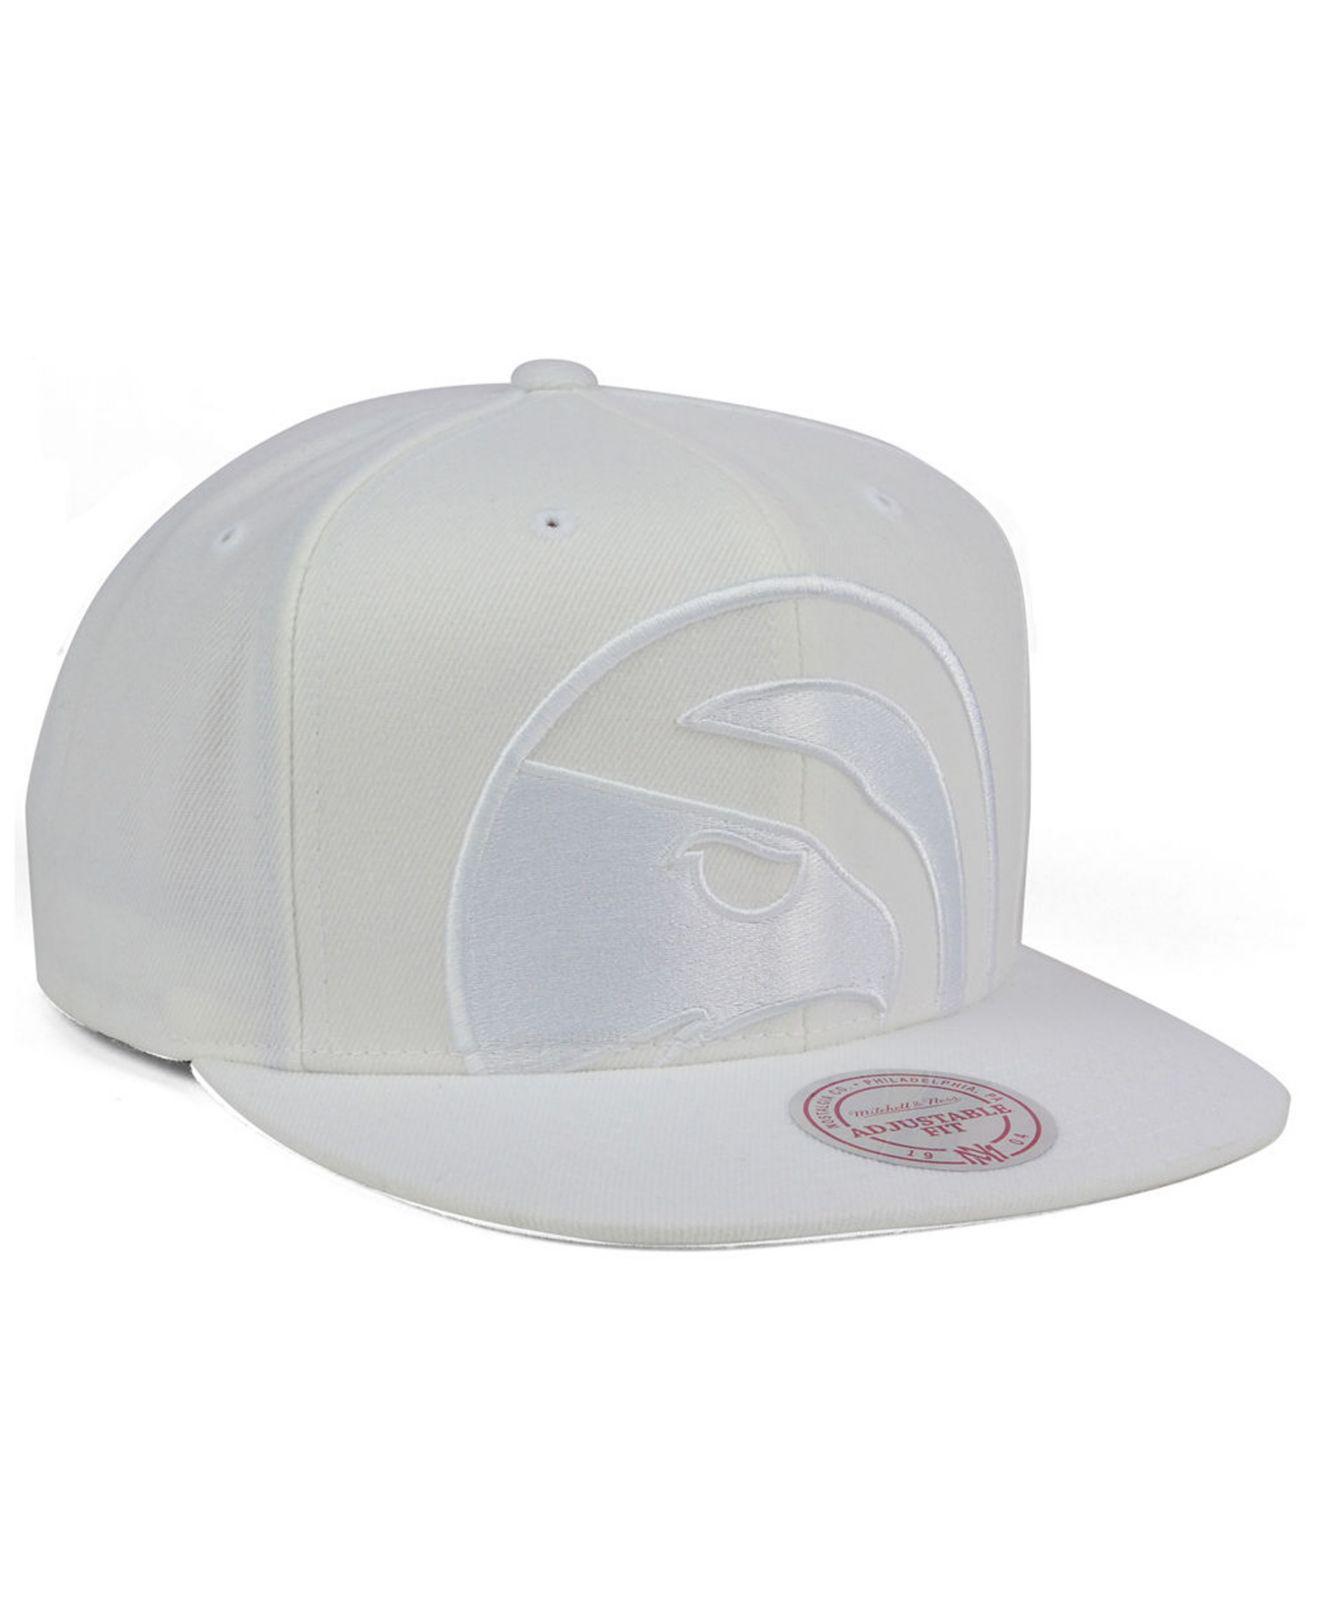 94c2fa1c817 Mitchell   Ness - White Atlanta Hawks Cropped Xl Logo Snapback Cap for Men  - Lyst. View fullscreen